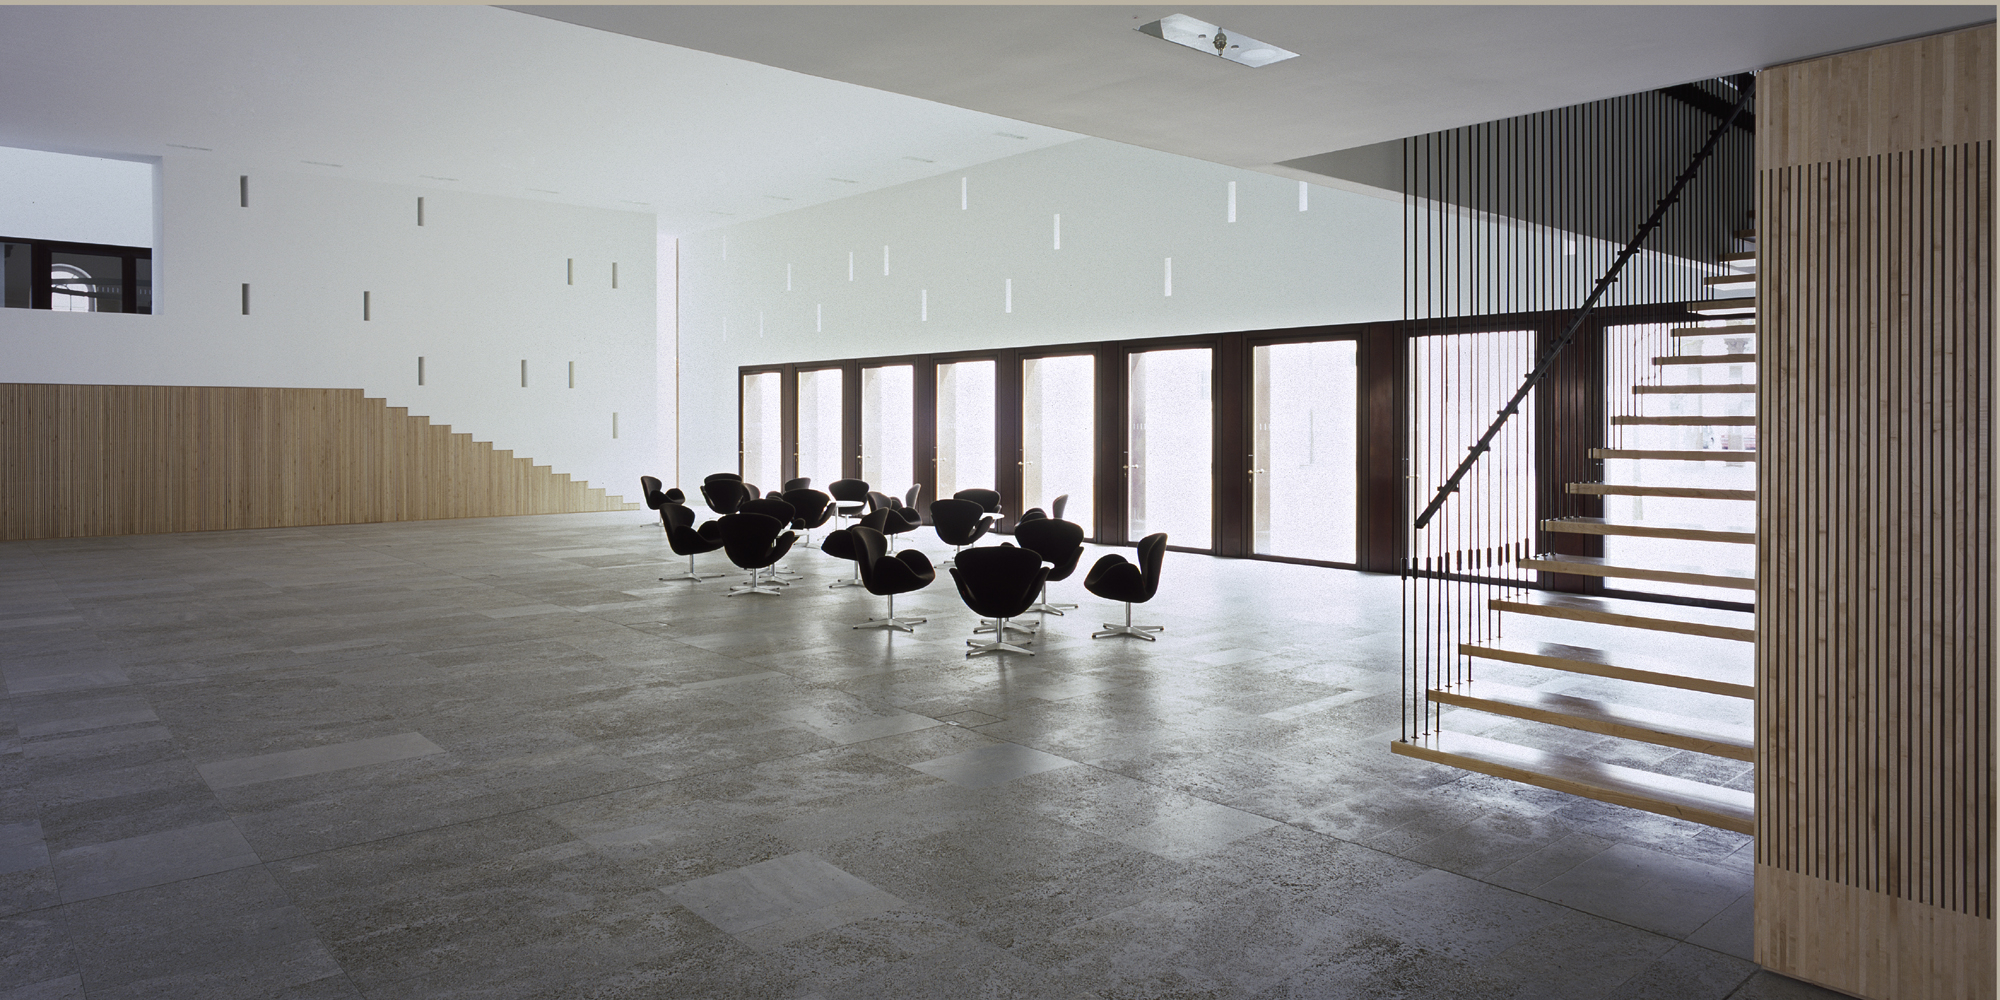 Plenarsaalgebaeude Hessischer Landtag - Halle